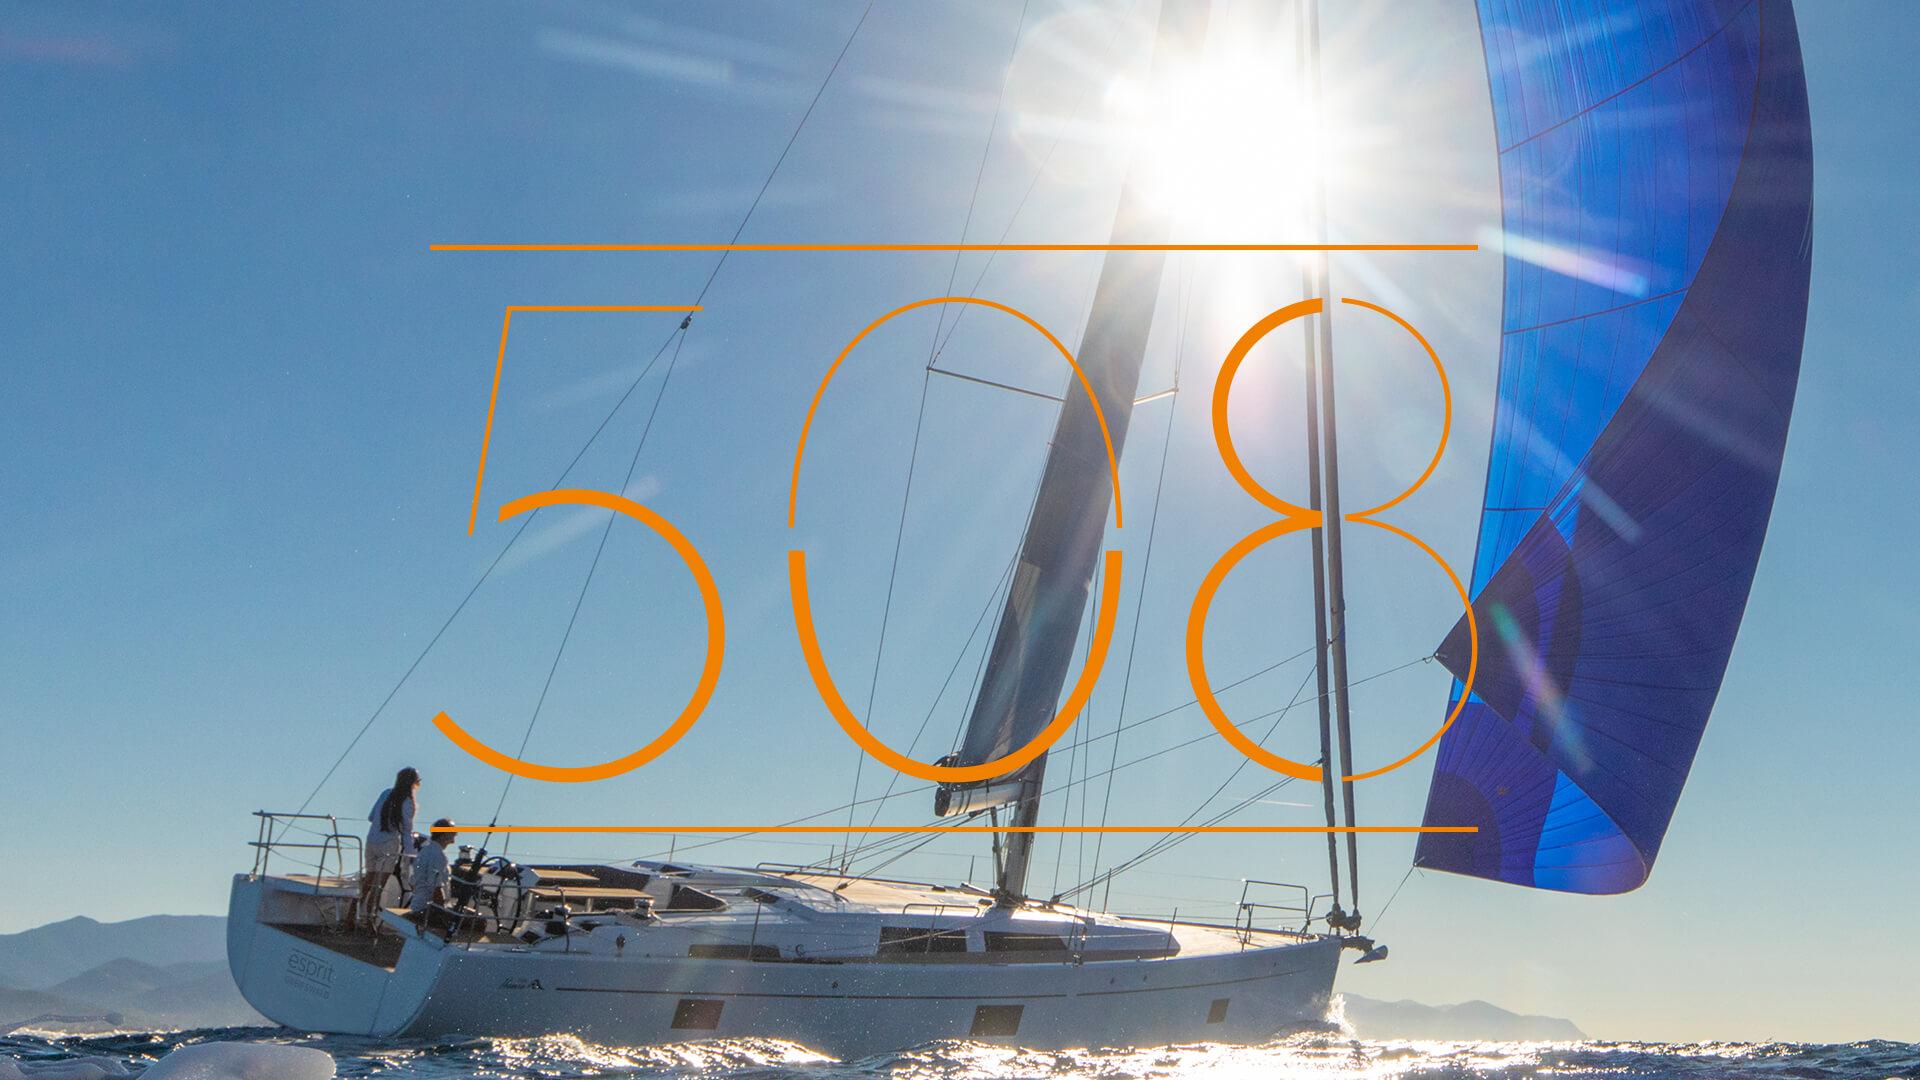 Hanse 508 explained in detail